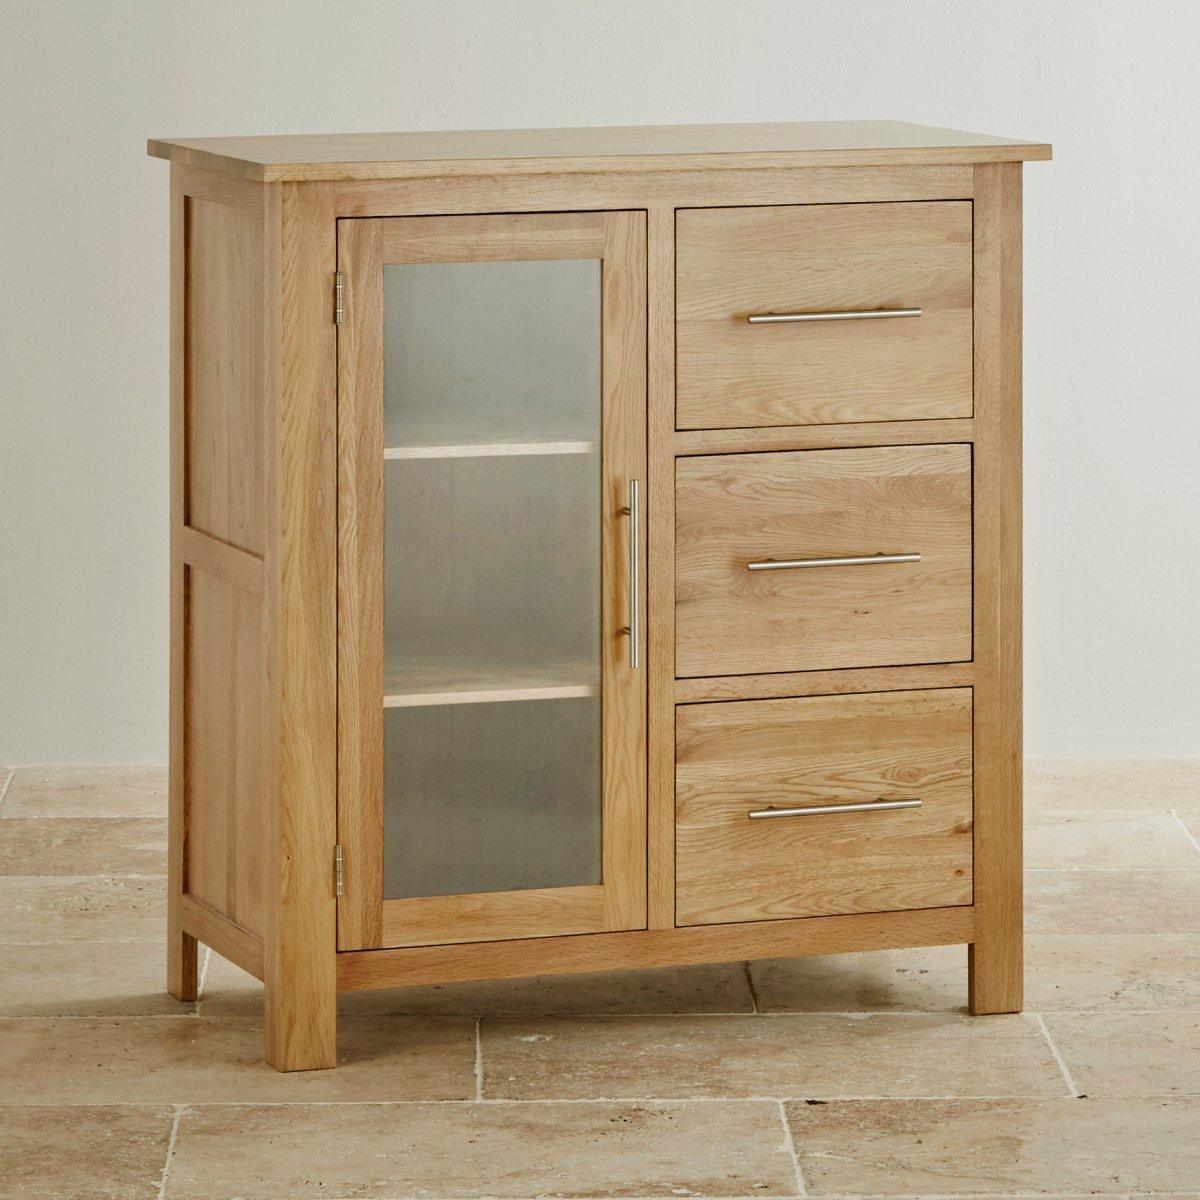 Natural Oak Kitchen Cabinets: Rivermead Glazed Media Cabinet In Solid Oak